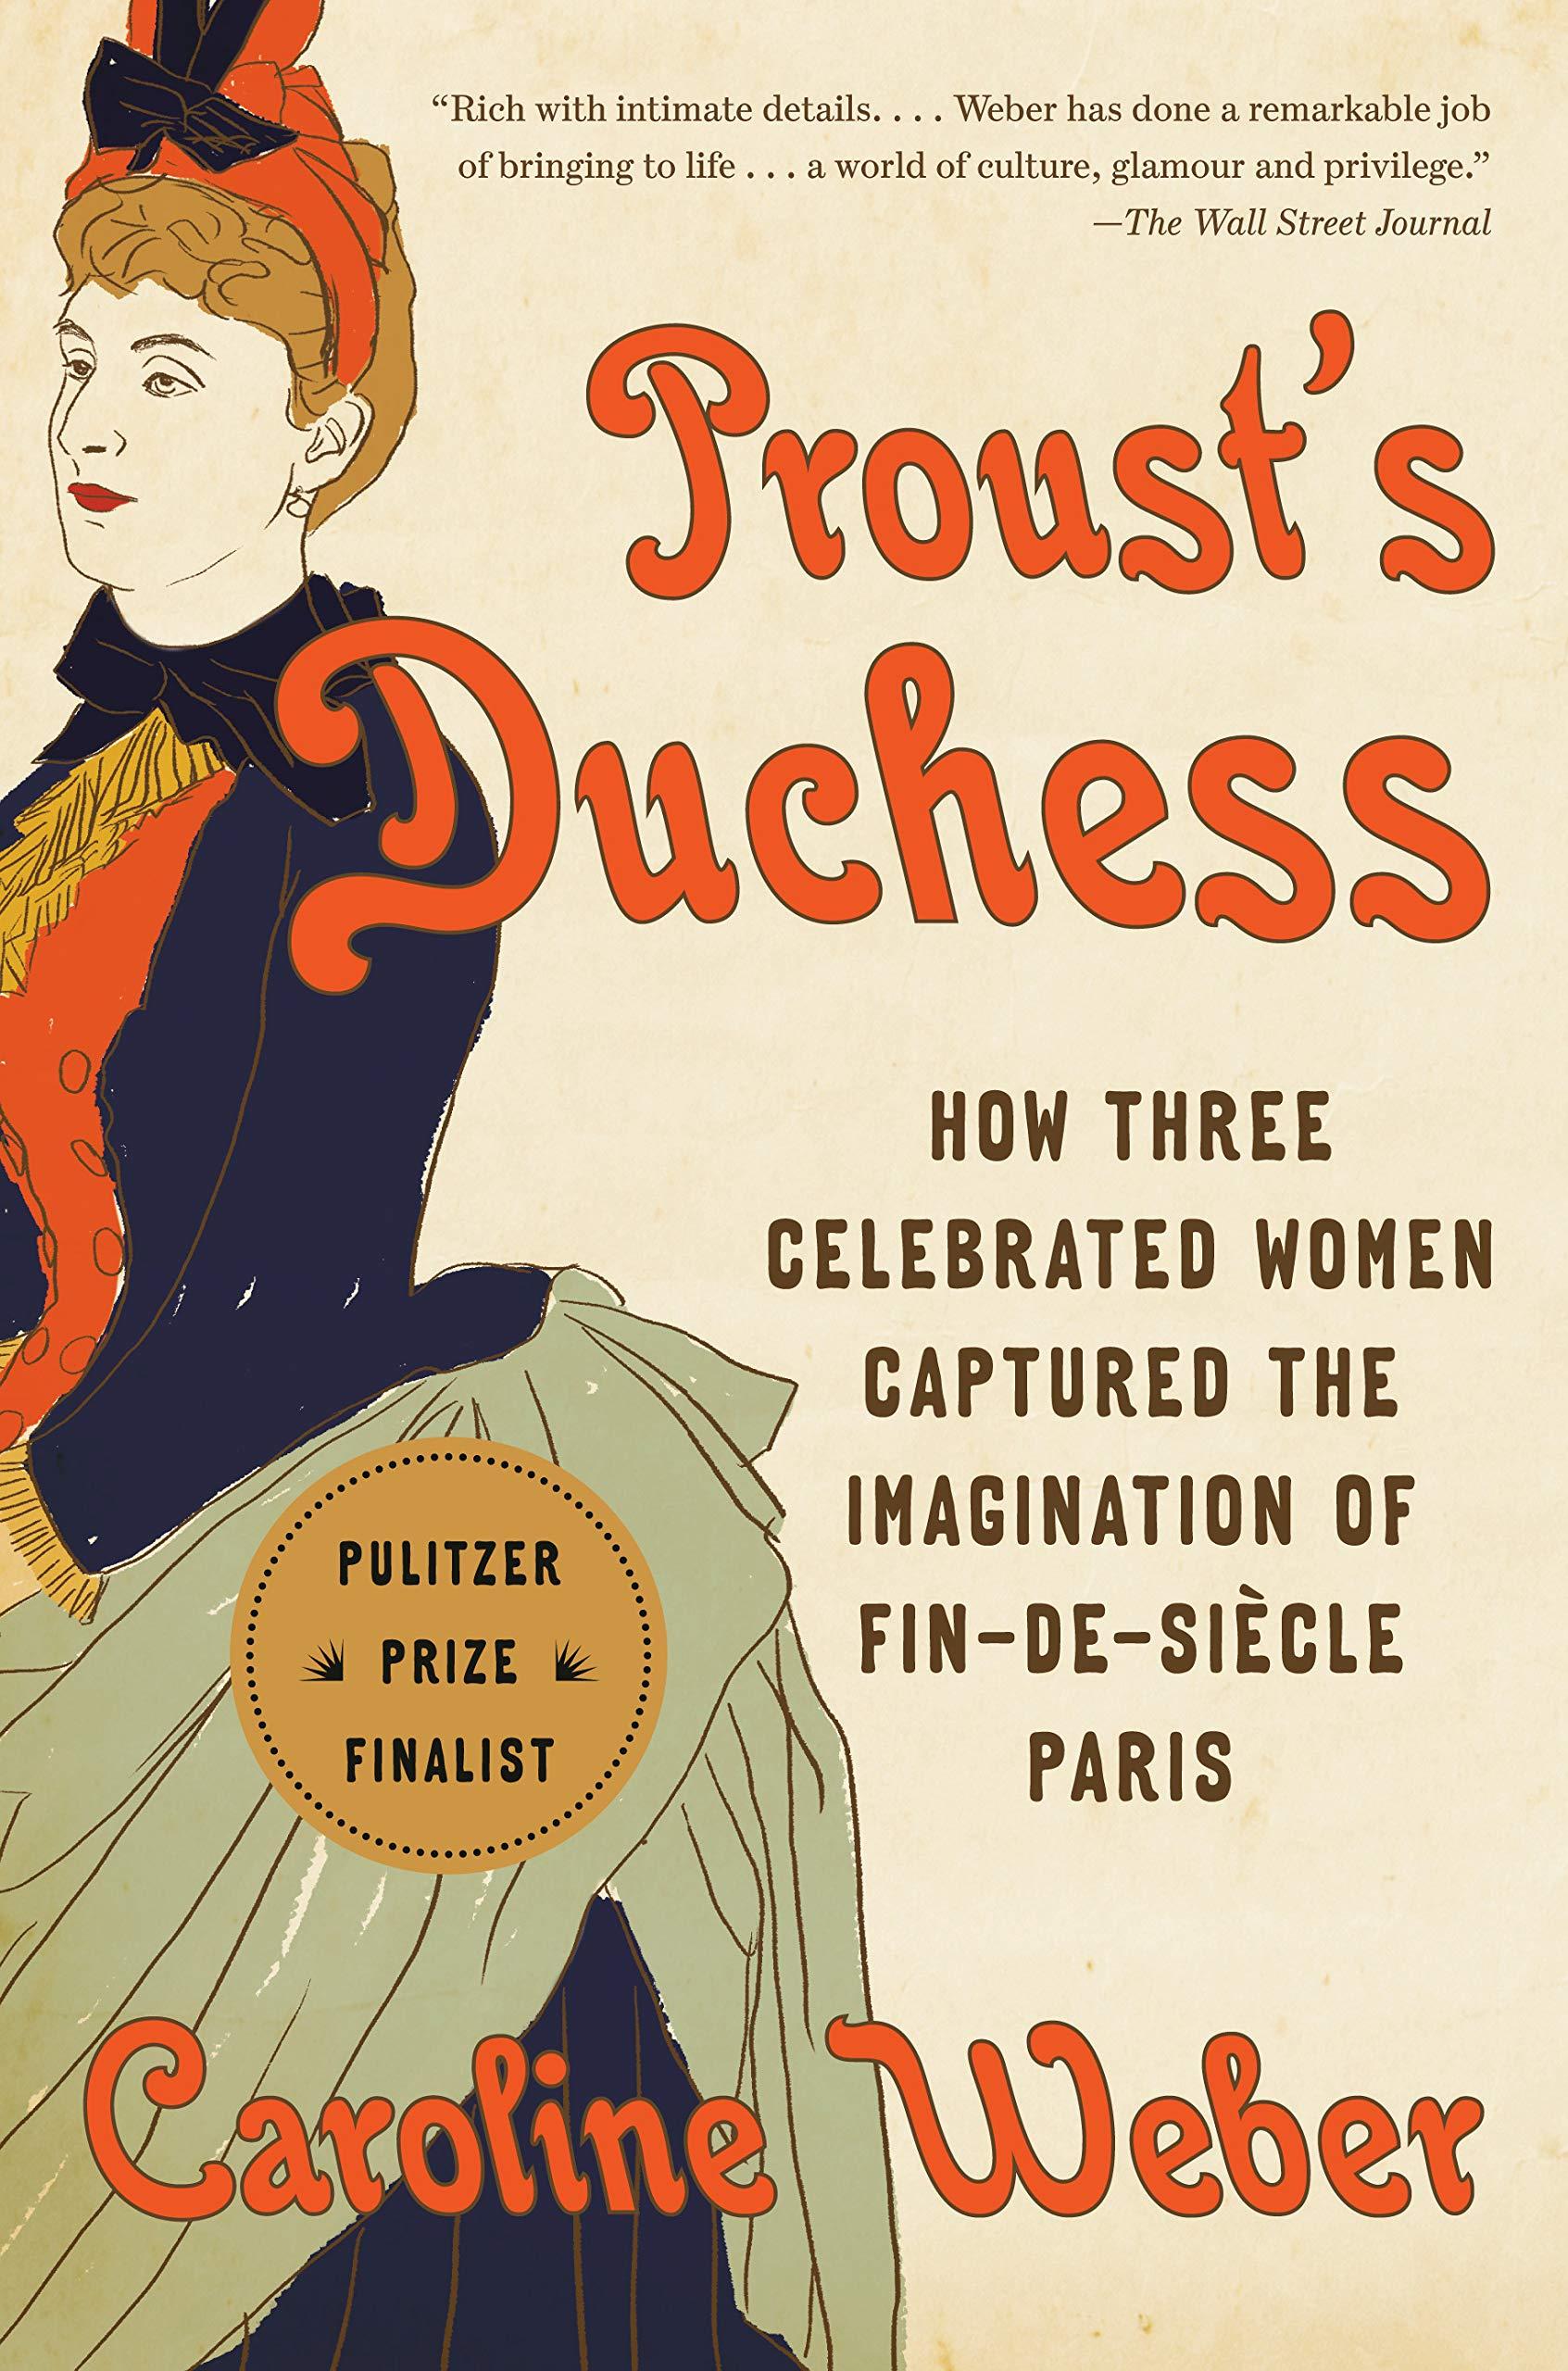 Prousts Duchess: How Three Celebrated Women Captured the Imagination of Fin-de-Siecle Paris VINTAGE: Amazon.es: Weber, Caroline: Libros en idiomas extranjeros